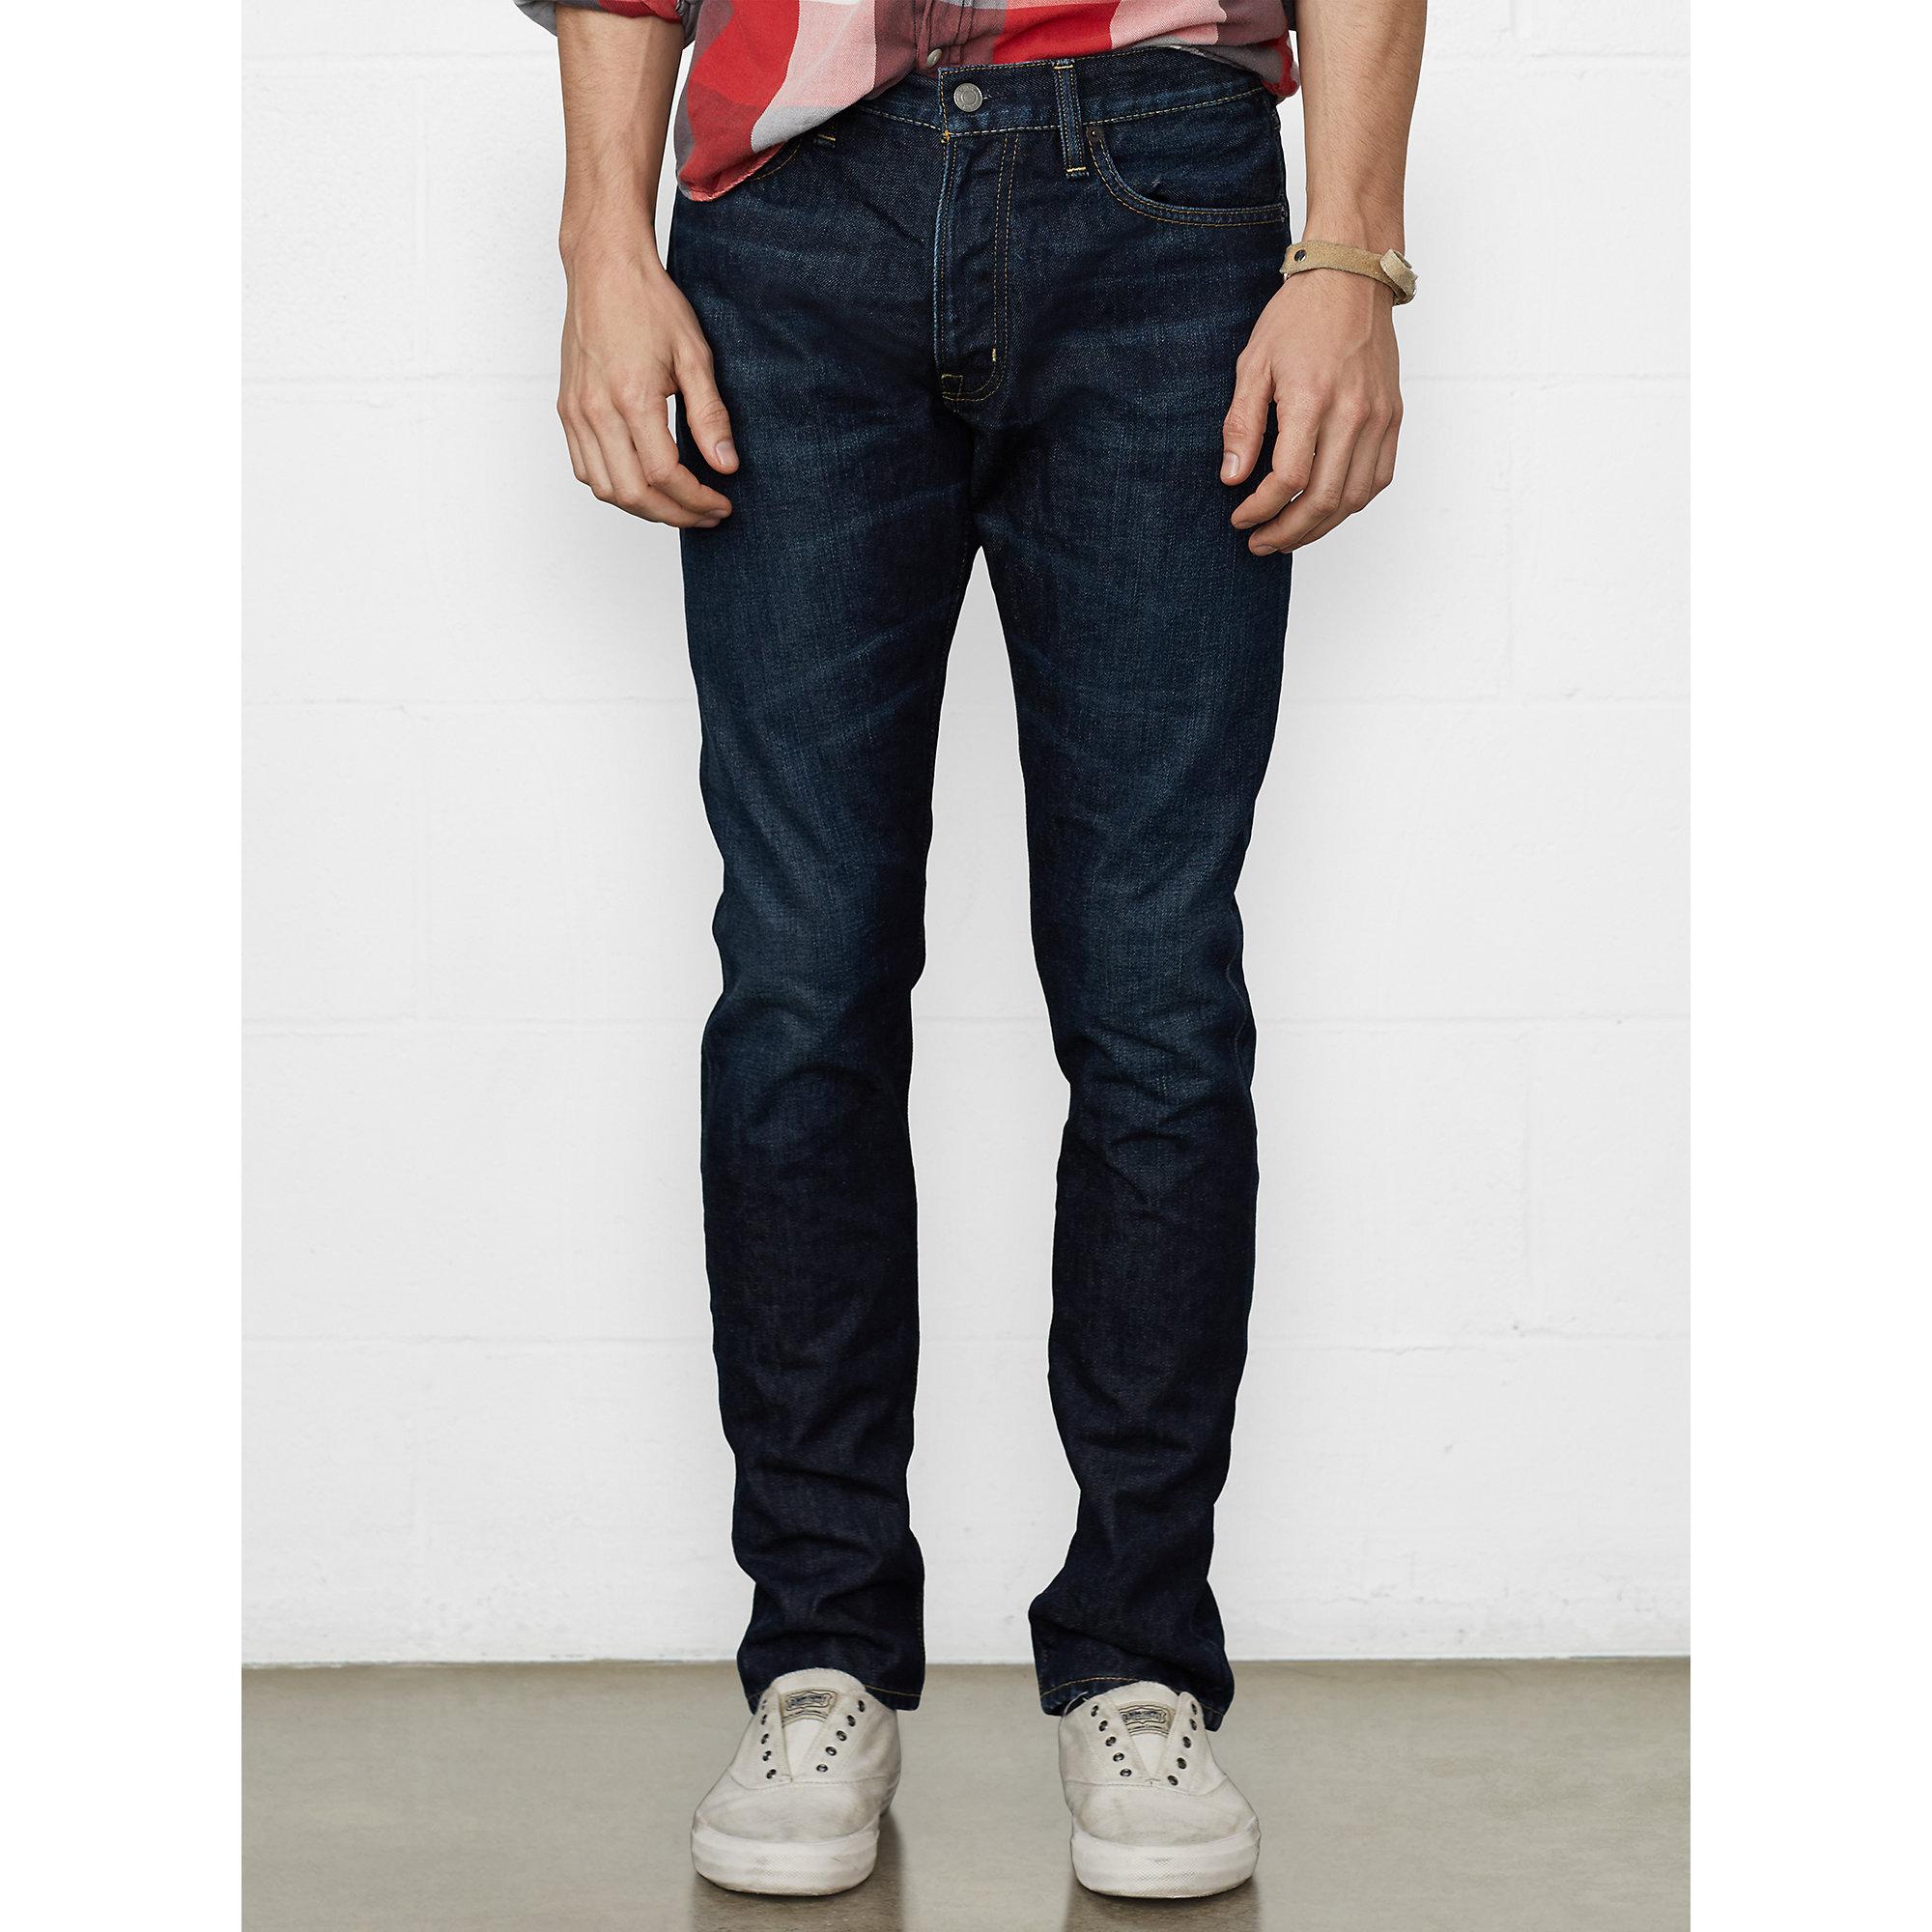 denim supply ralph lauren tapered straight ekins jean in blue for men lyst. Black Bedroom Furniture Sets. Home Design Ideas